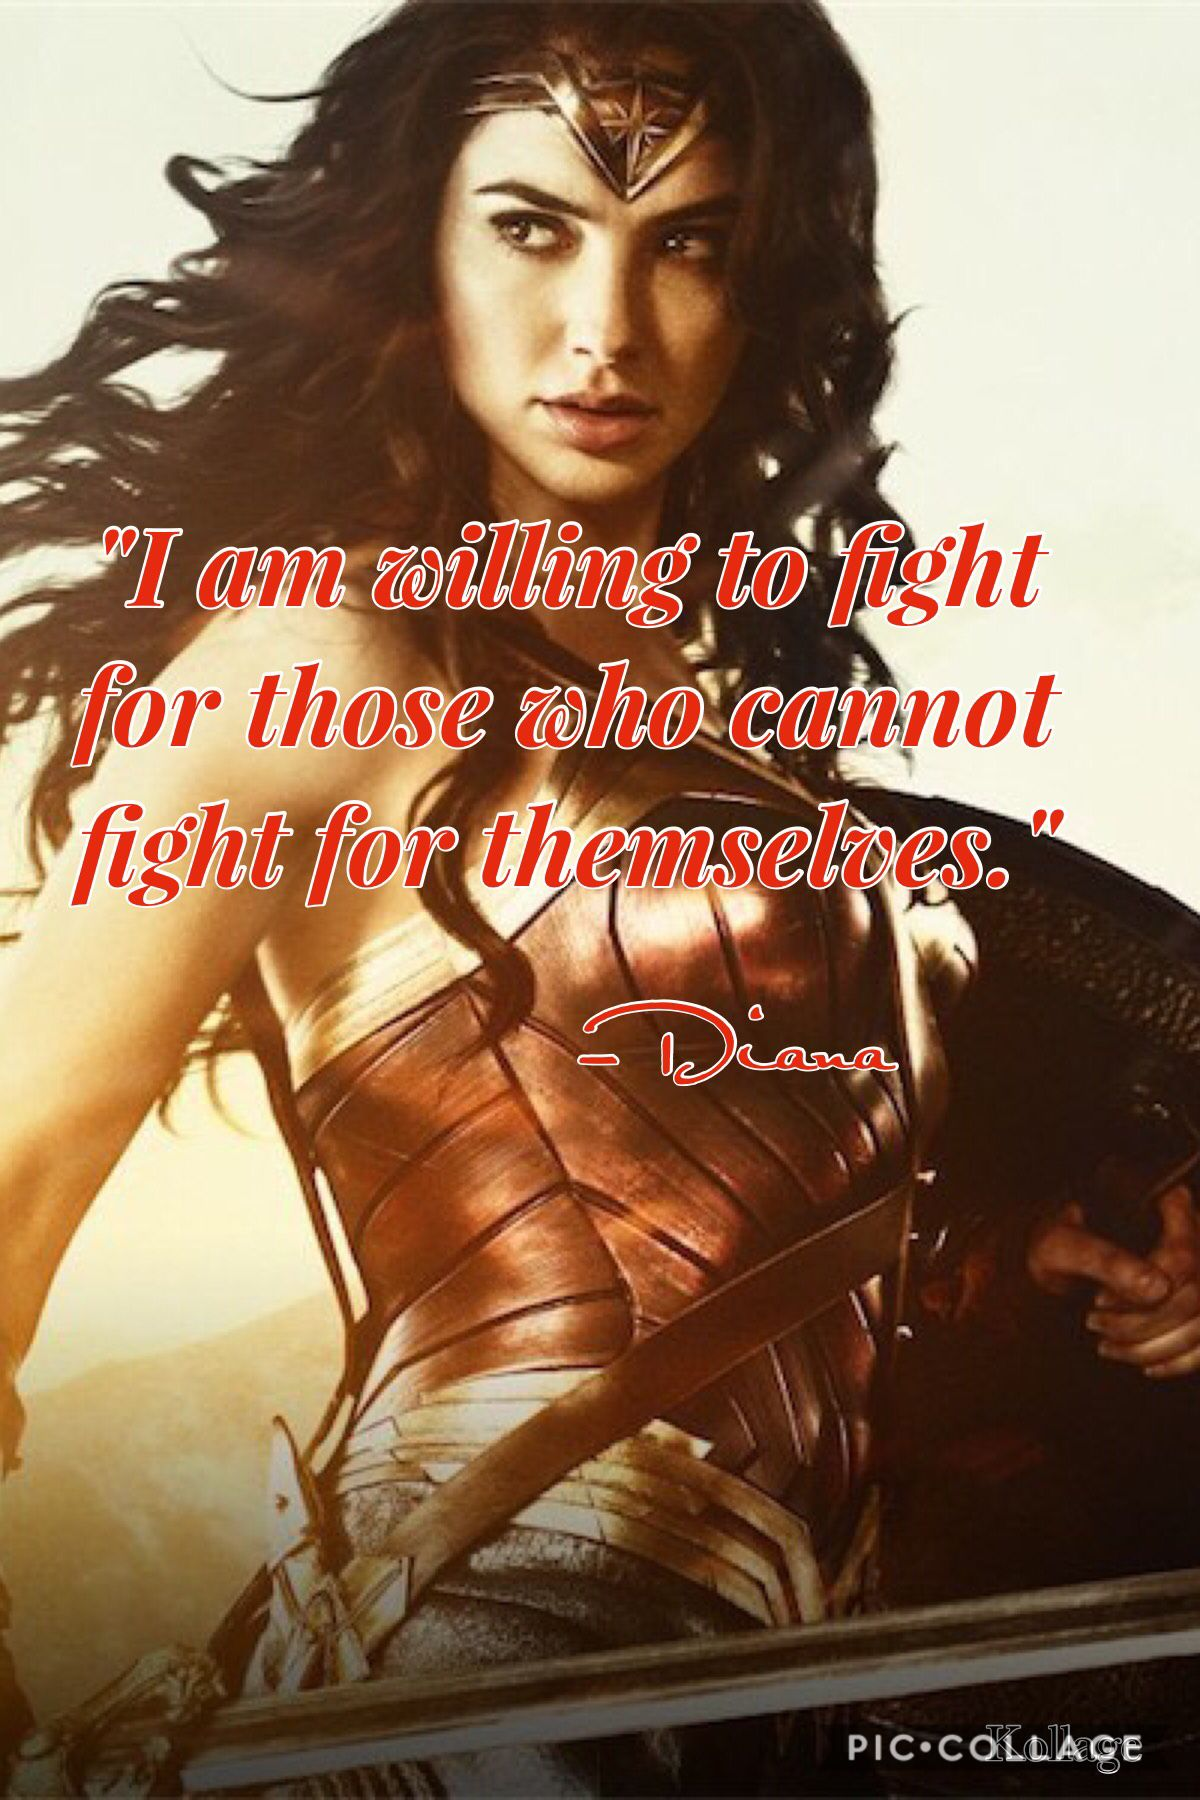 Wonder Woman Quotes Wonder Woman Quotes | MI BC 3Day Tent | Wonder Woman, Wonder woman  Wonder Woman Quotes